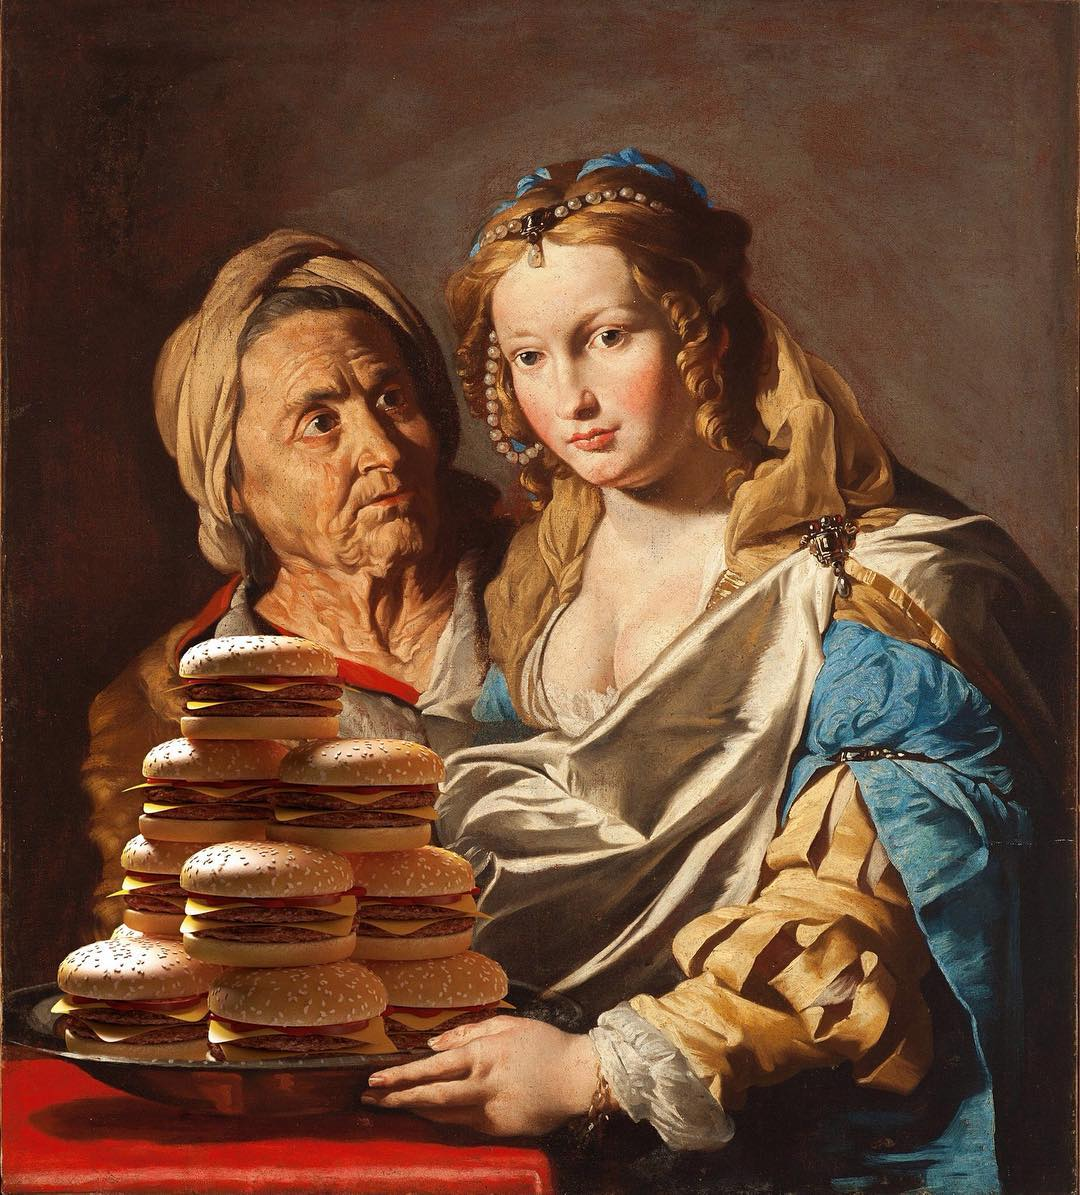 «Ваш бургер, Мадонна»: герои полотен Ренессанса поглощают горы фастфуда (13 фото)